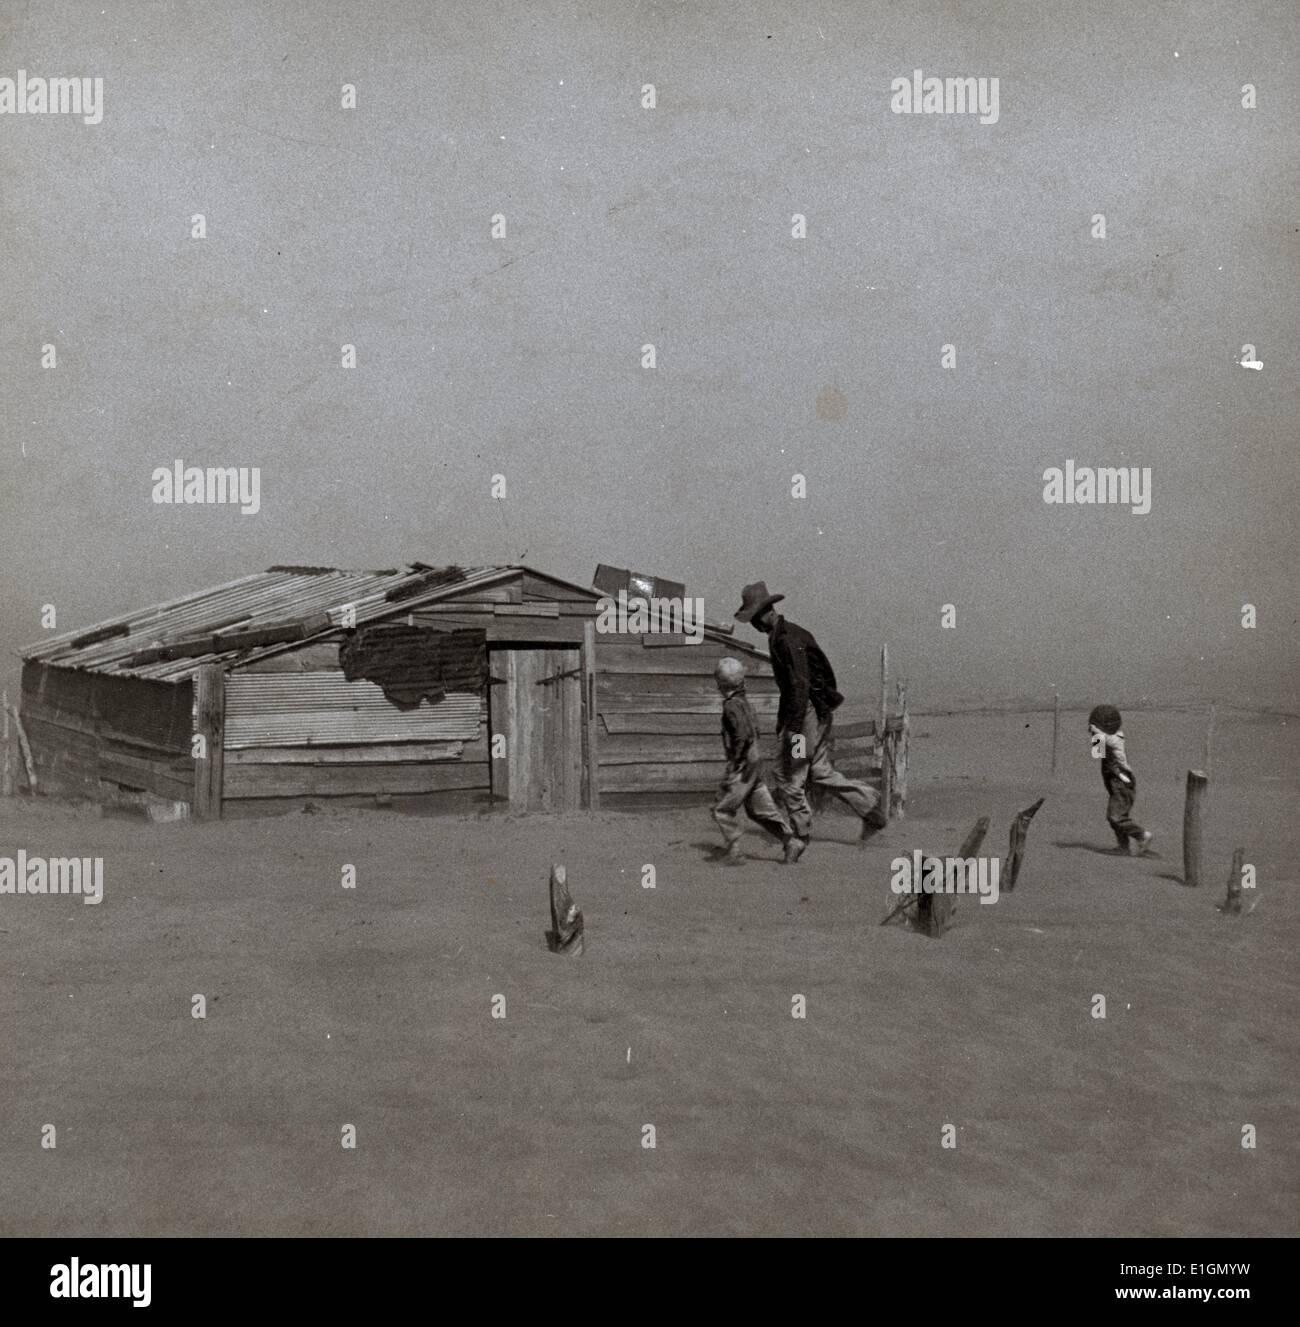 Dust Storm - Stock Image